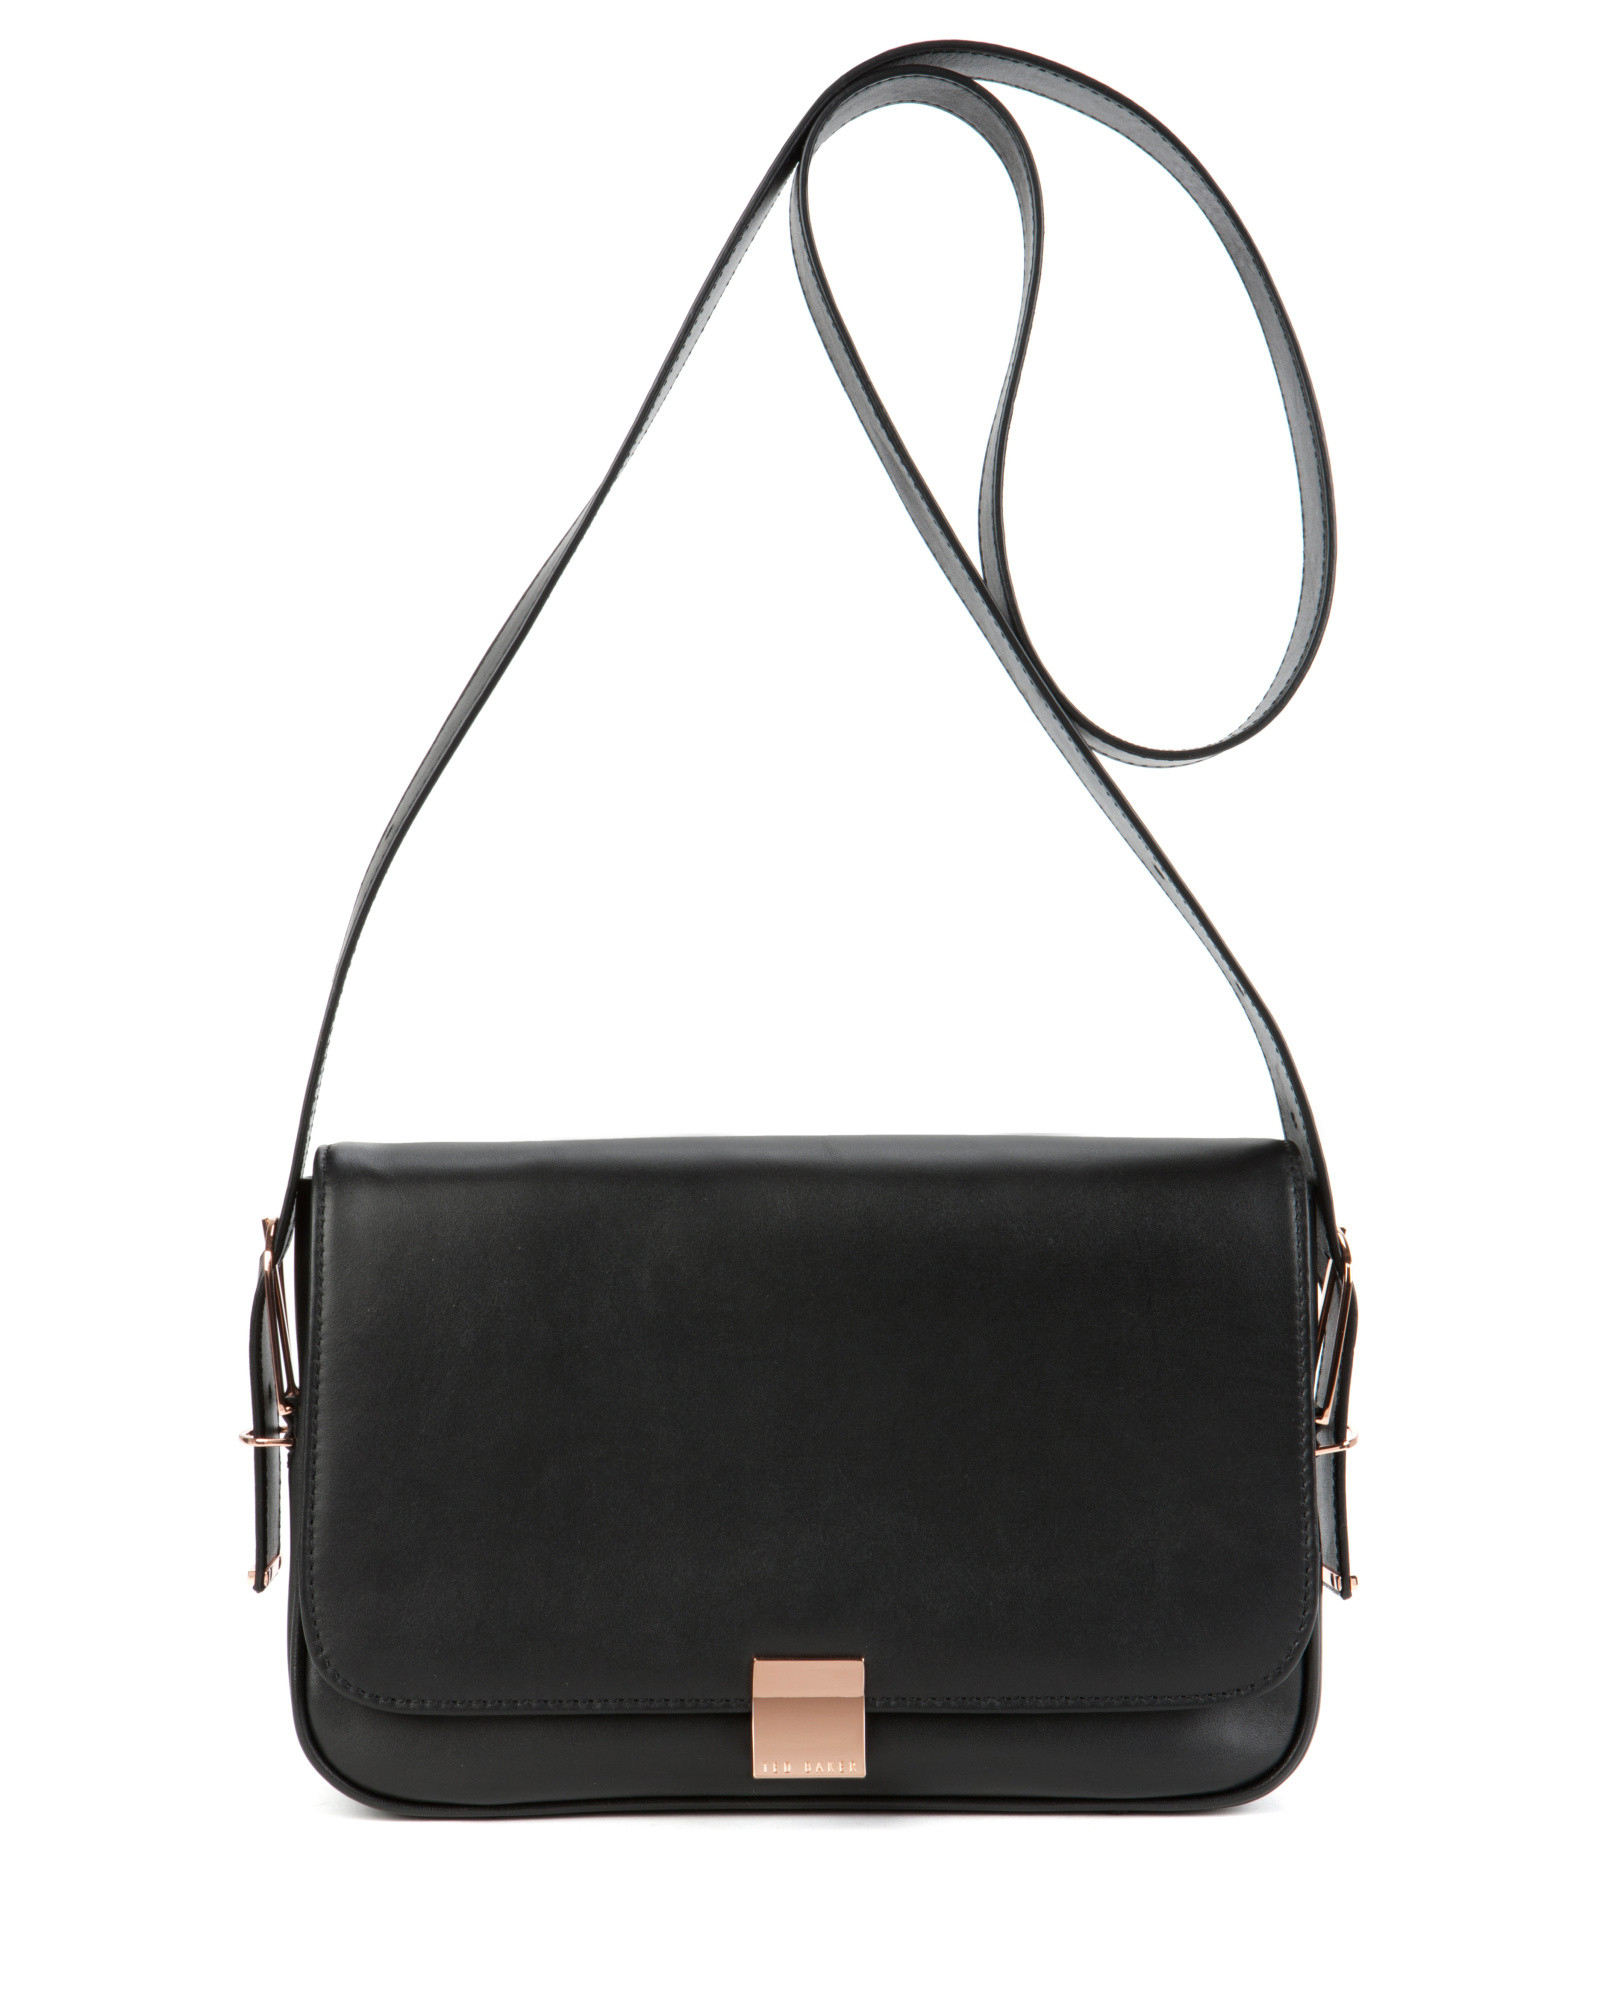 Ted baker Leather Sling Bag in Black | Lyst